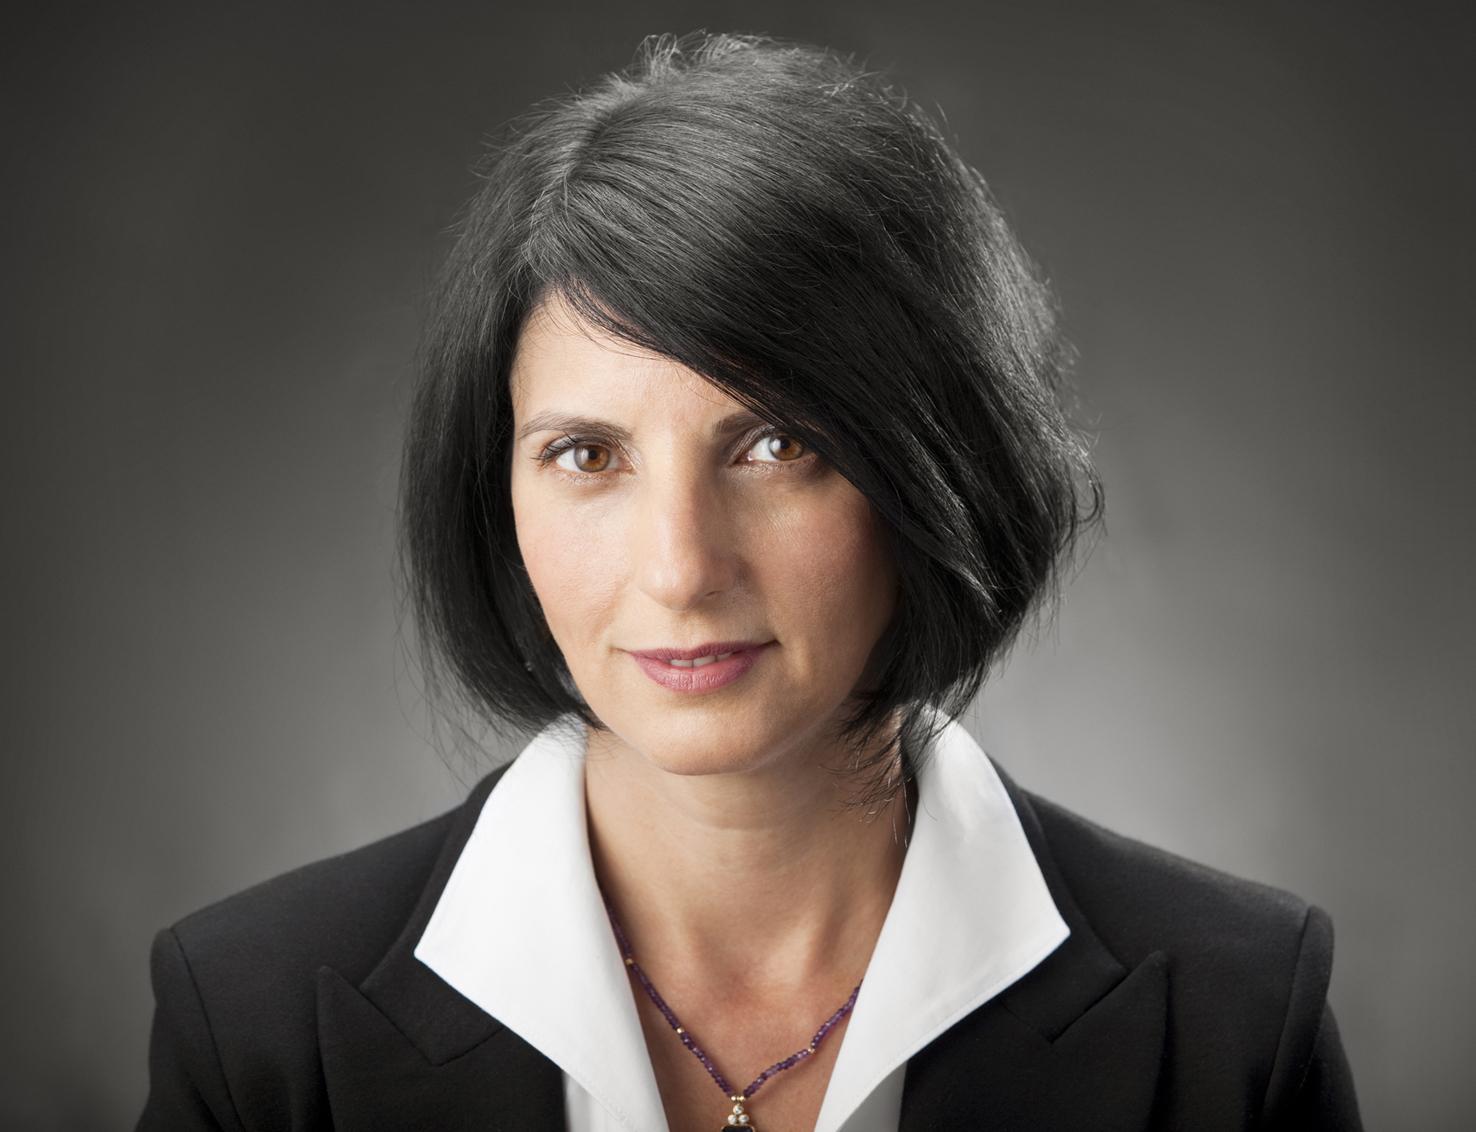 Iris Beck-Codner